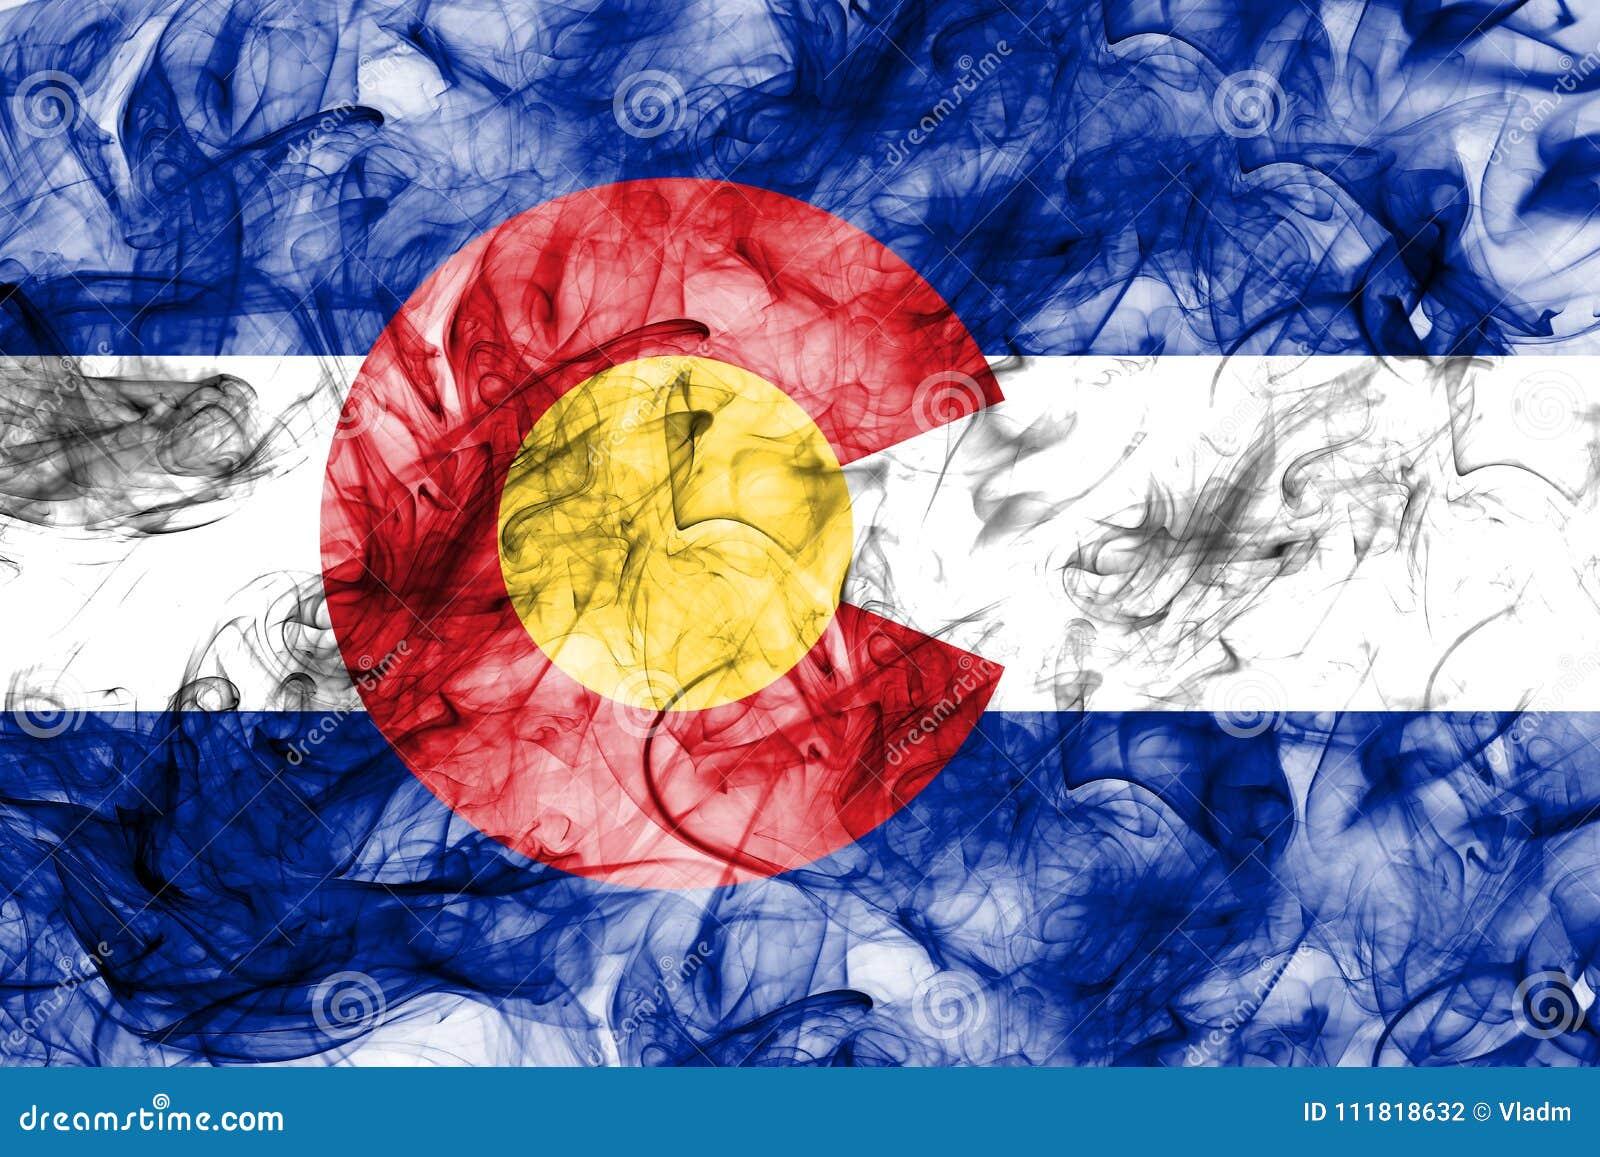 Colorado state smoke flag, United States Of America